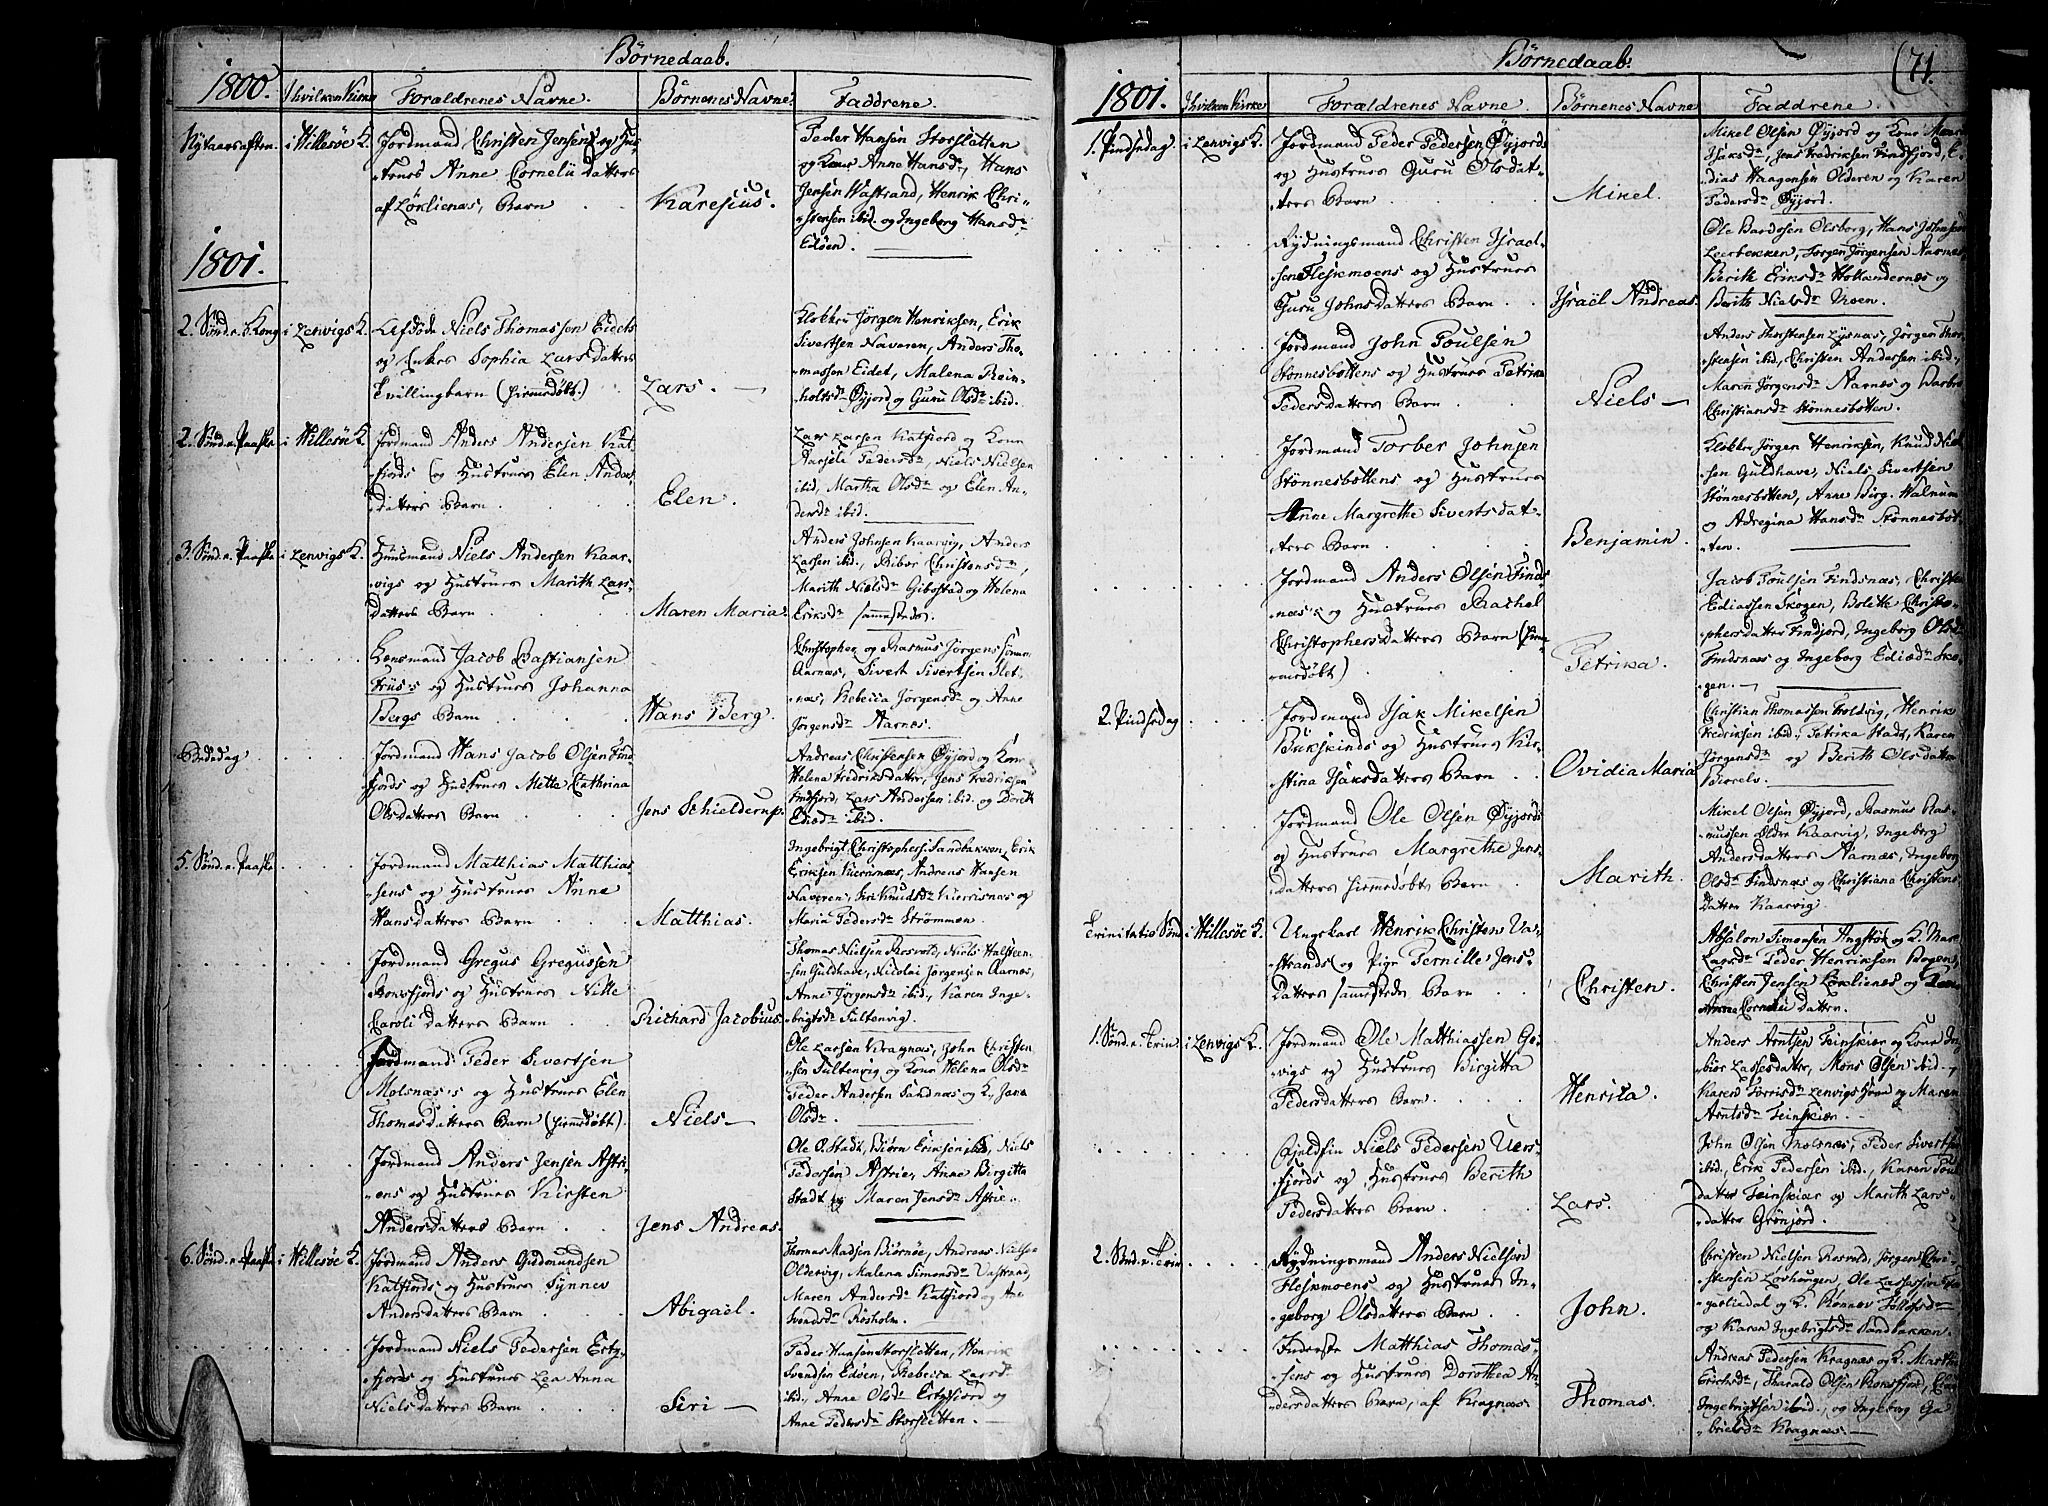 SATØ, Lenvik sokneprestembete, H/Ha/Haa/L0002kirke: Ministerialbok nr. 2, 1784-1820, s. 71